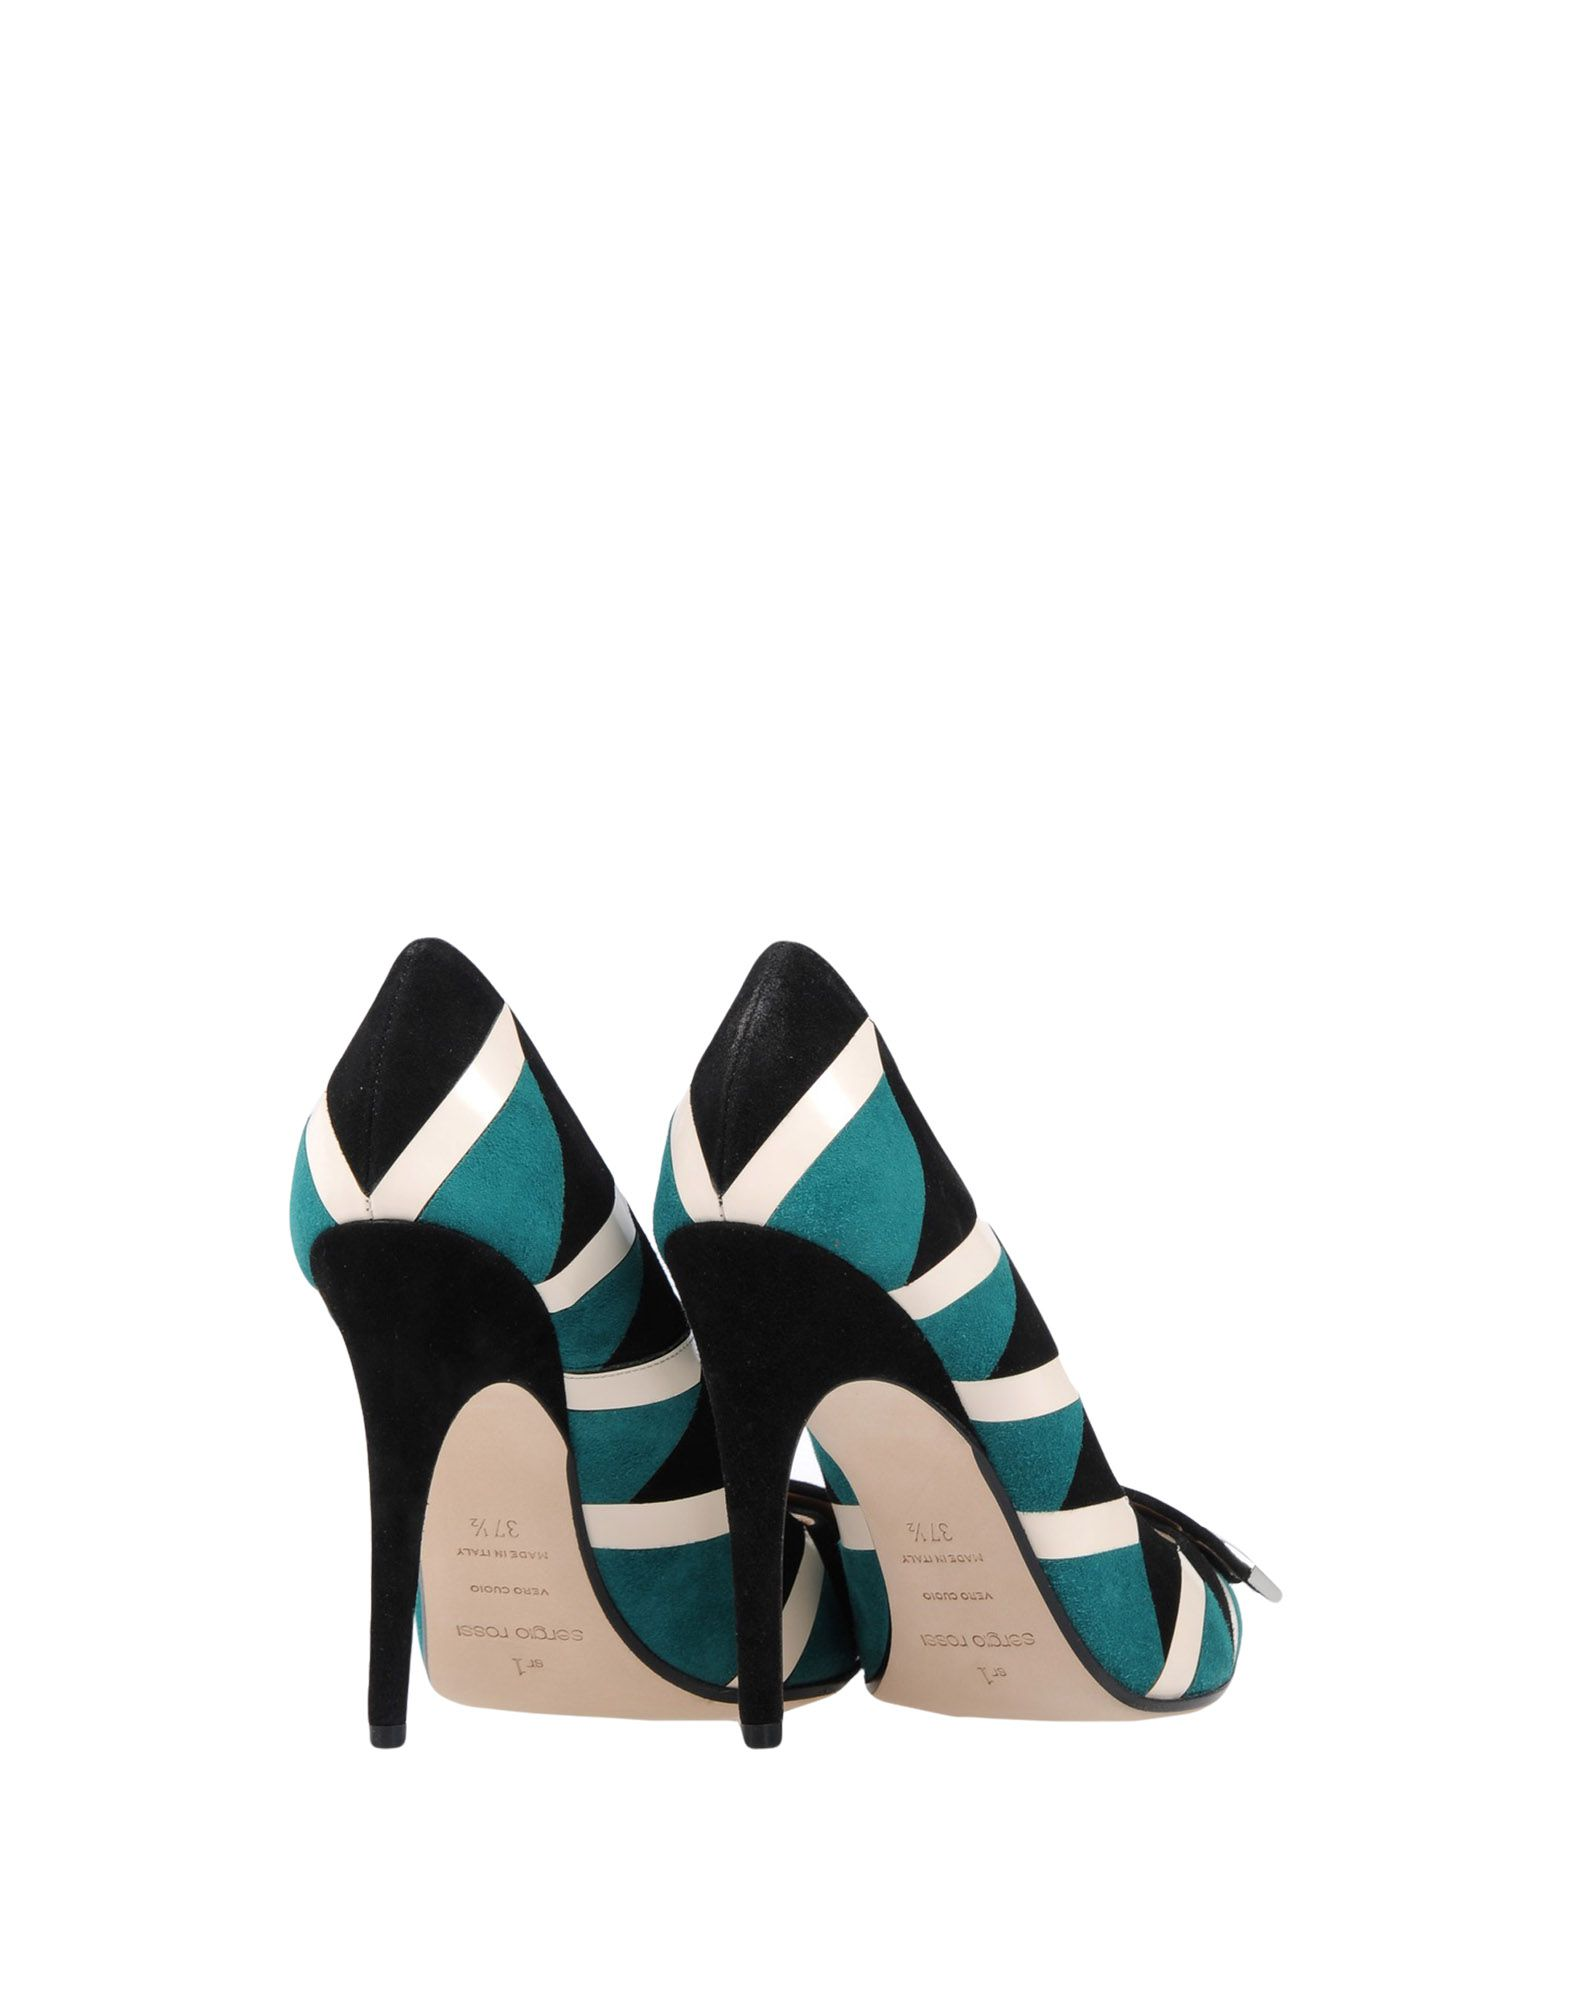 Sergio Rossi Pumps Damen Schuhe  11482661WEGünstige gut aussehende Schuhe Damen 4cfbac